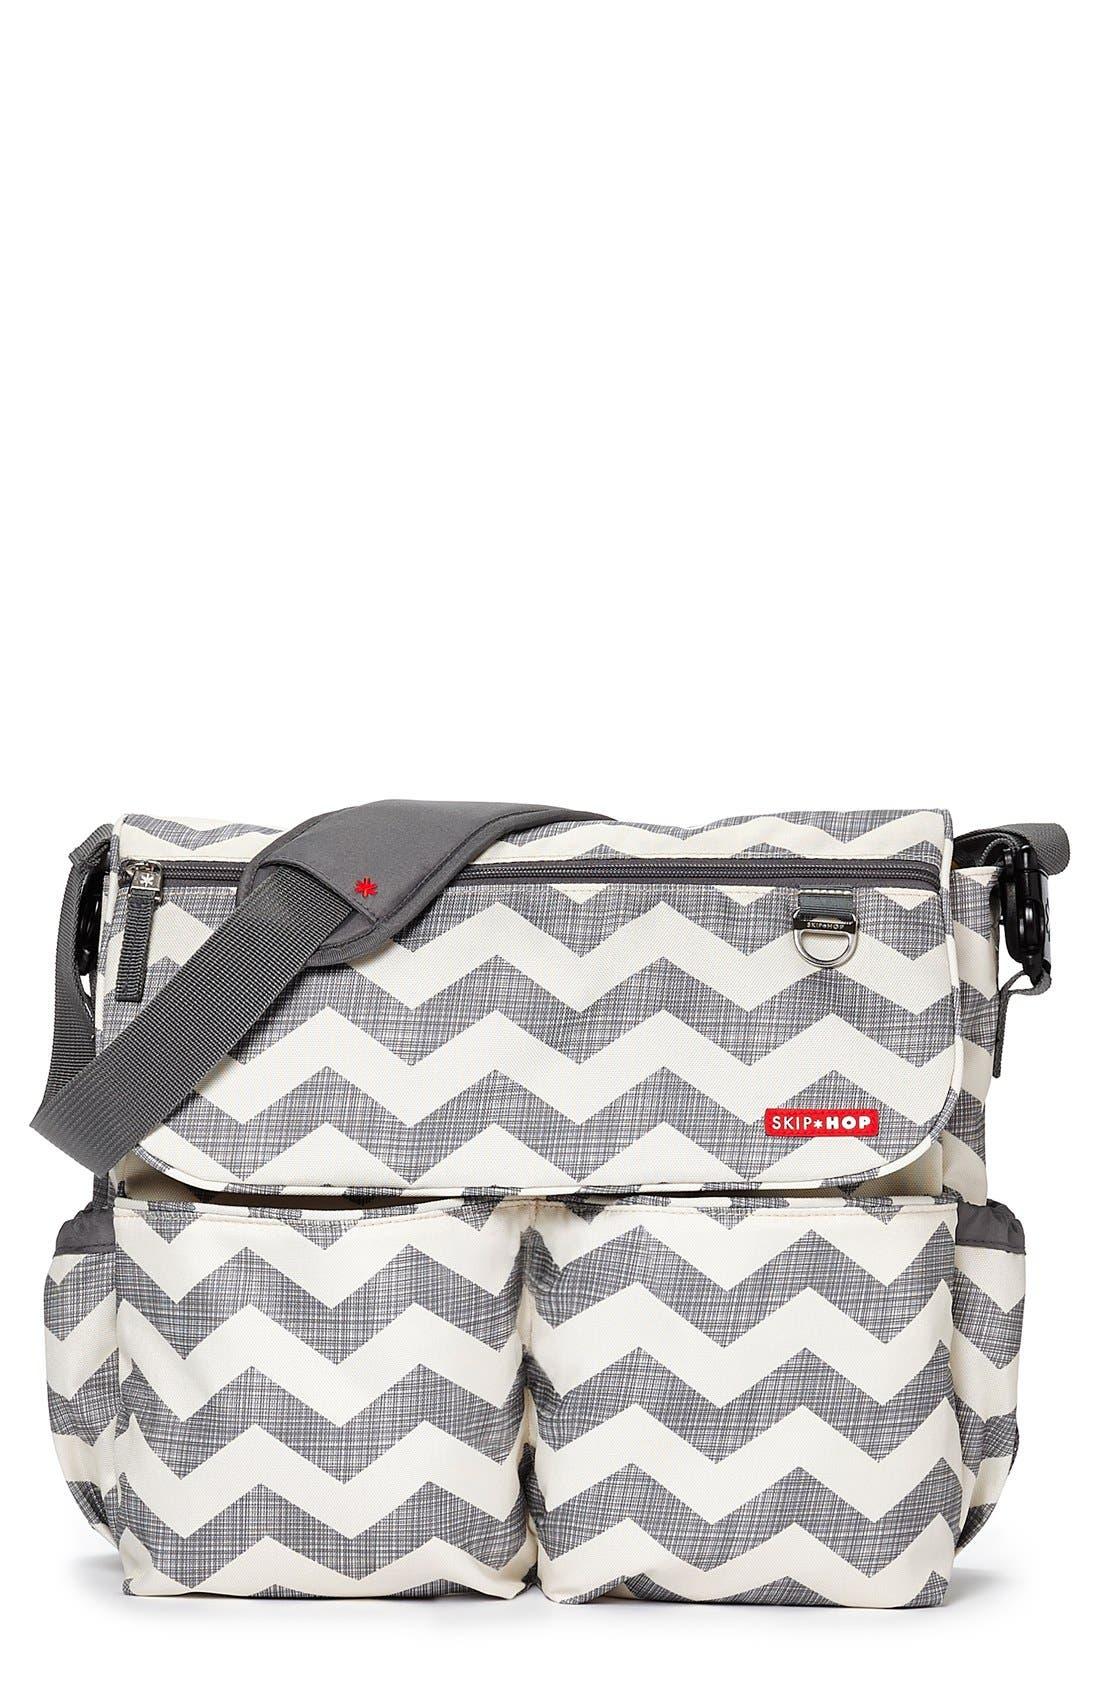 'Dash Signature' Messenger Diaper Bag,                         Main,                         color, Grey